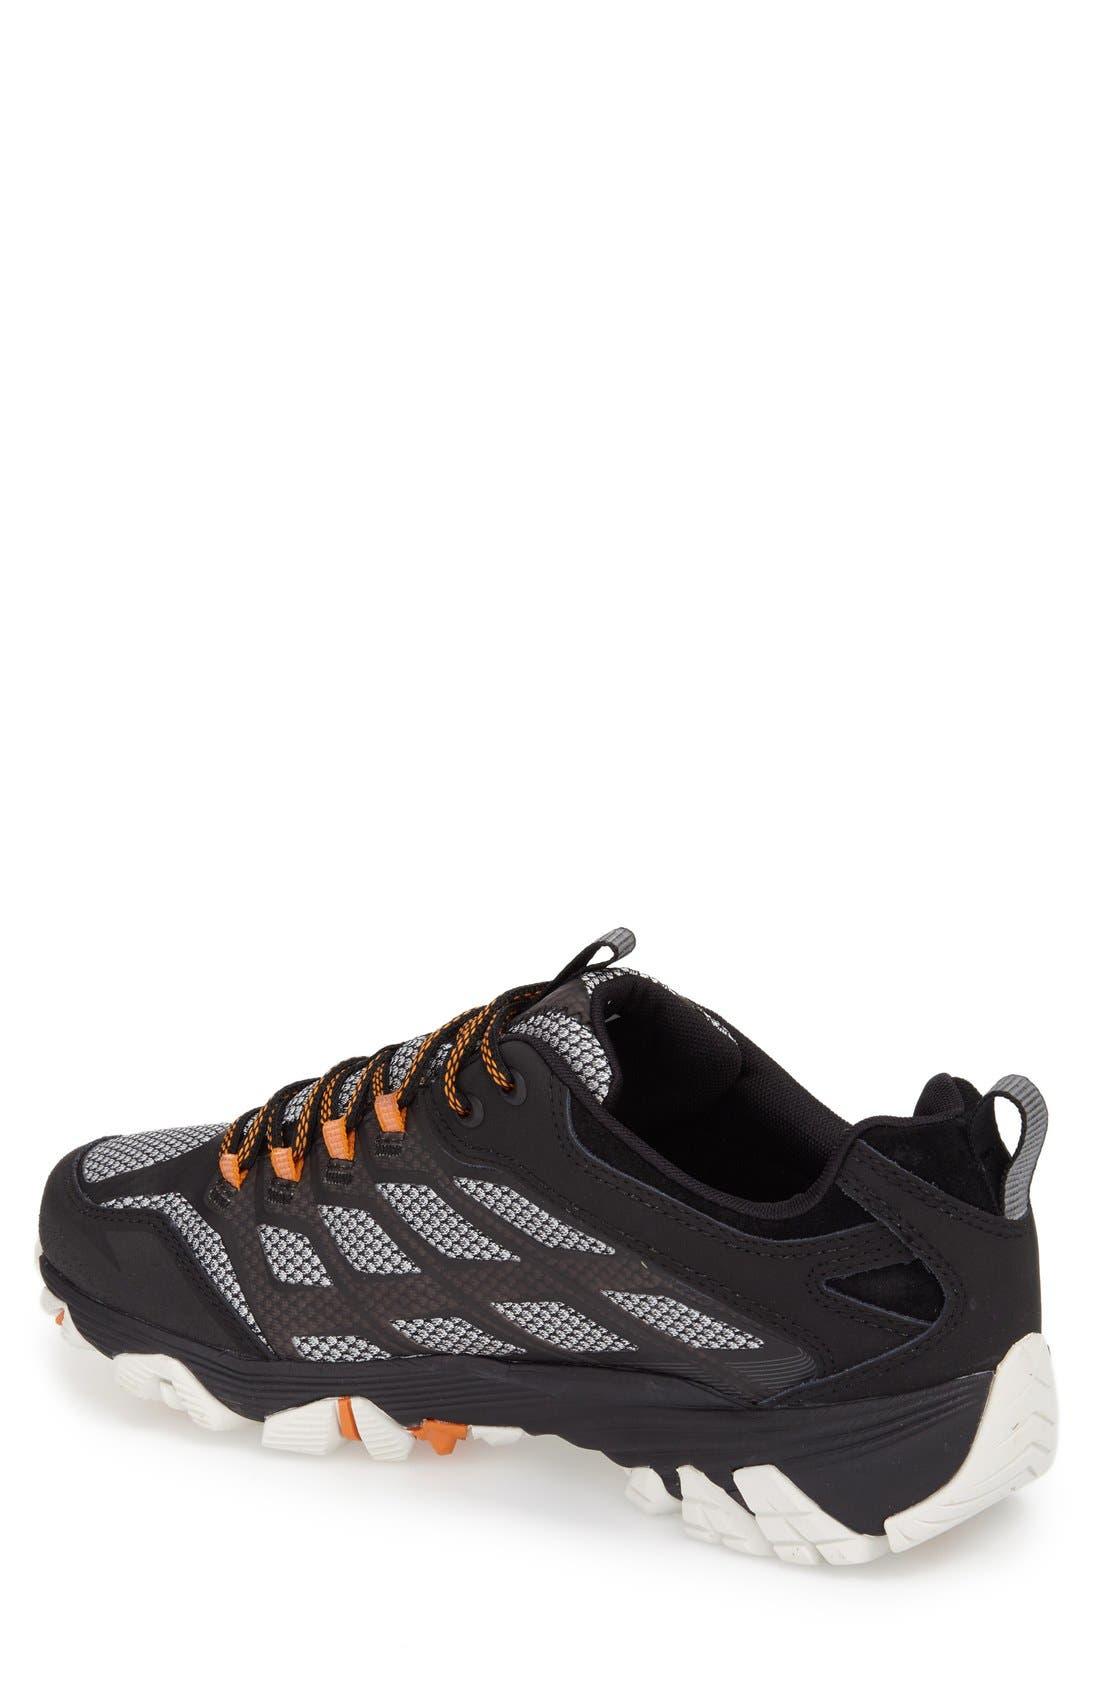 Moab FST Waterproof Hiking Shoe,                             Alternate thumbnail 2, color,                             001